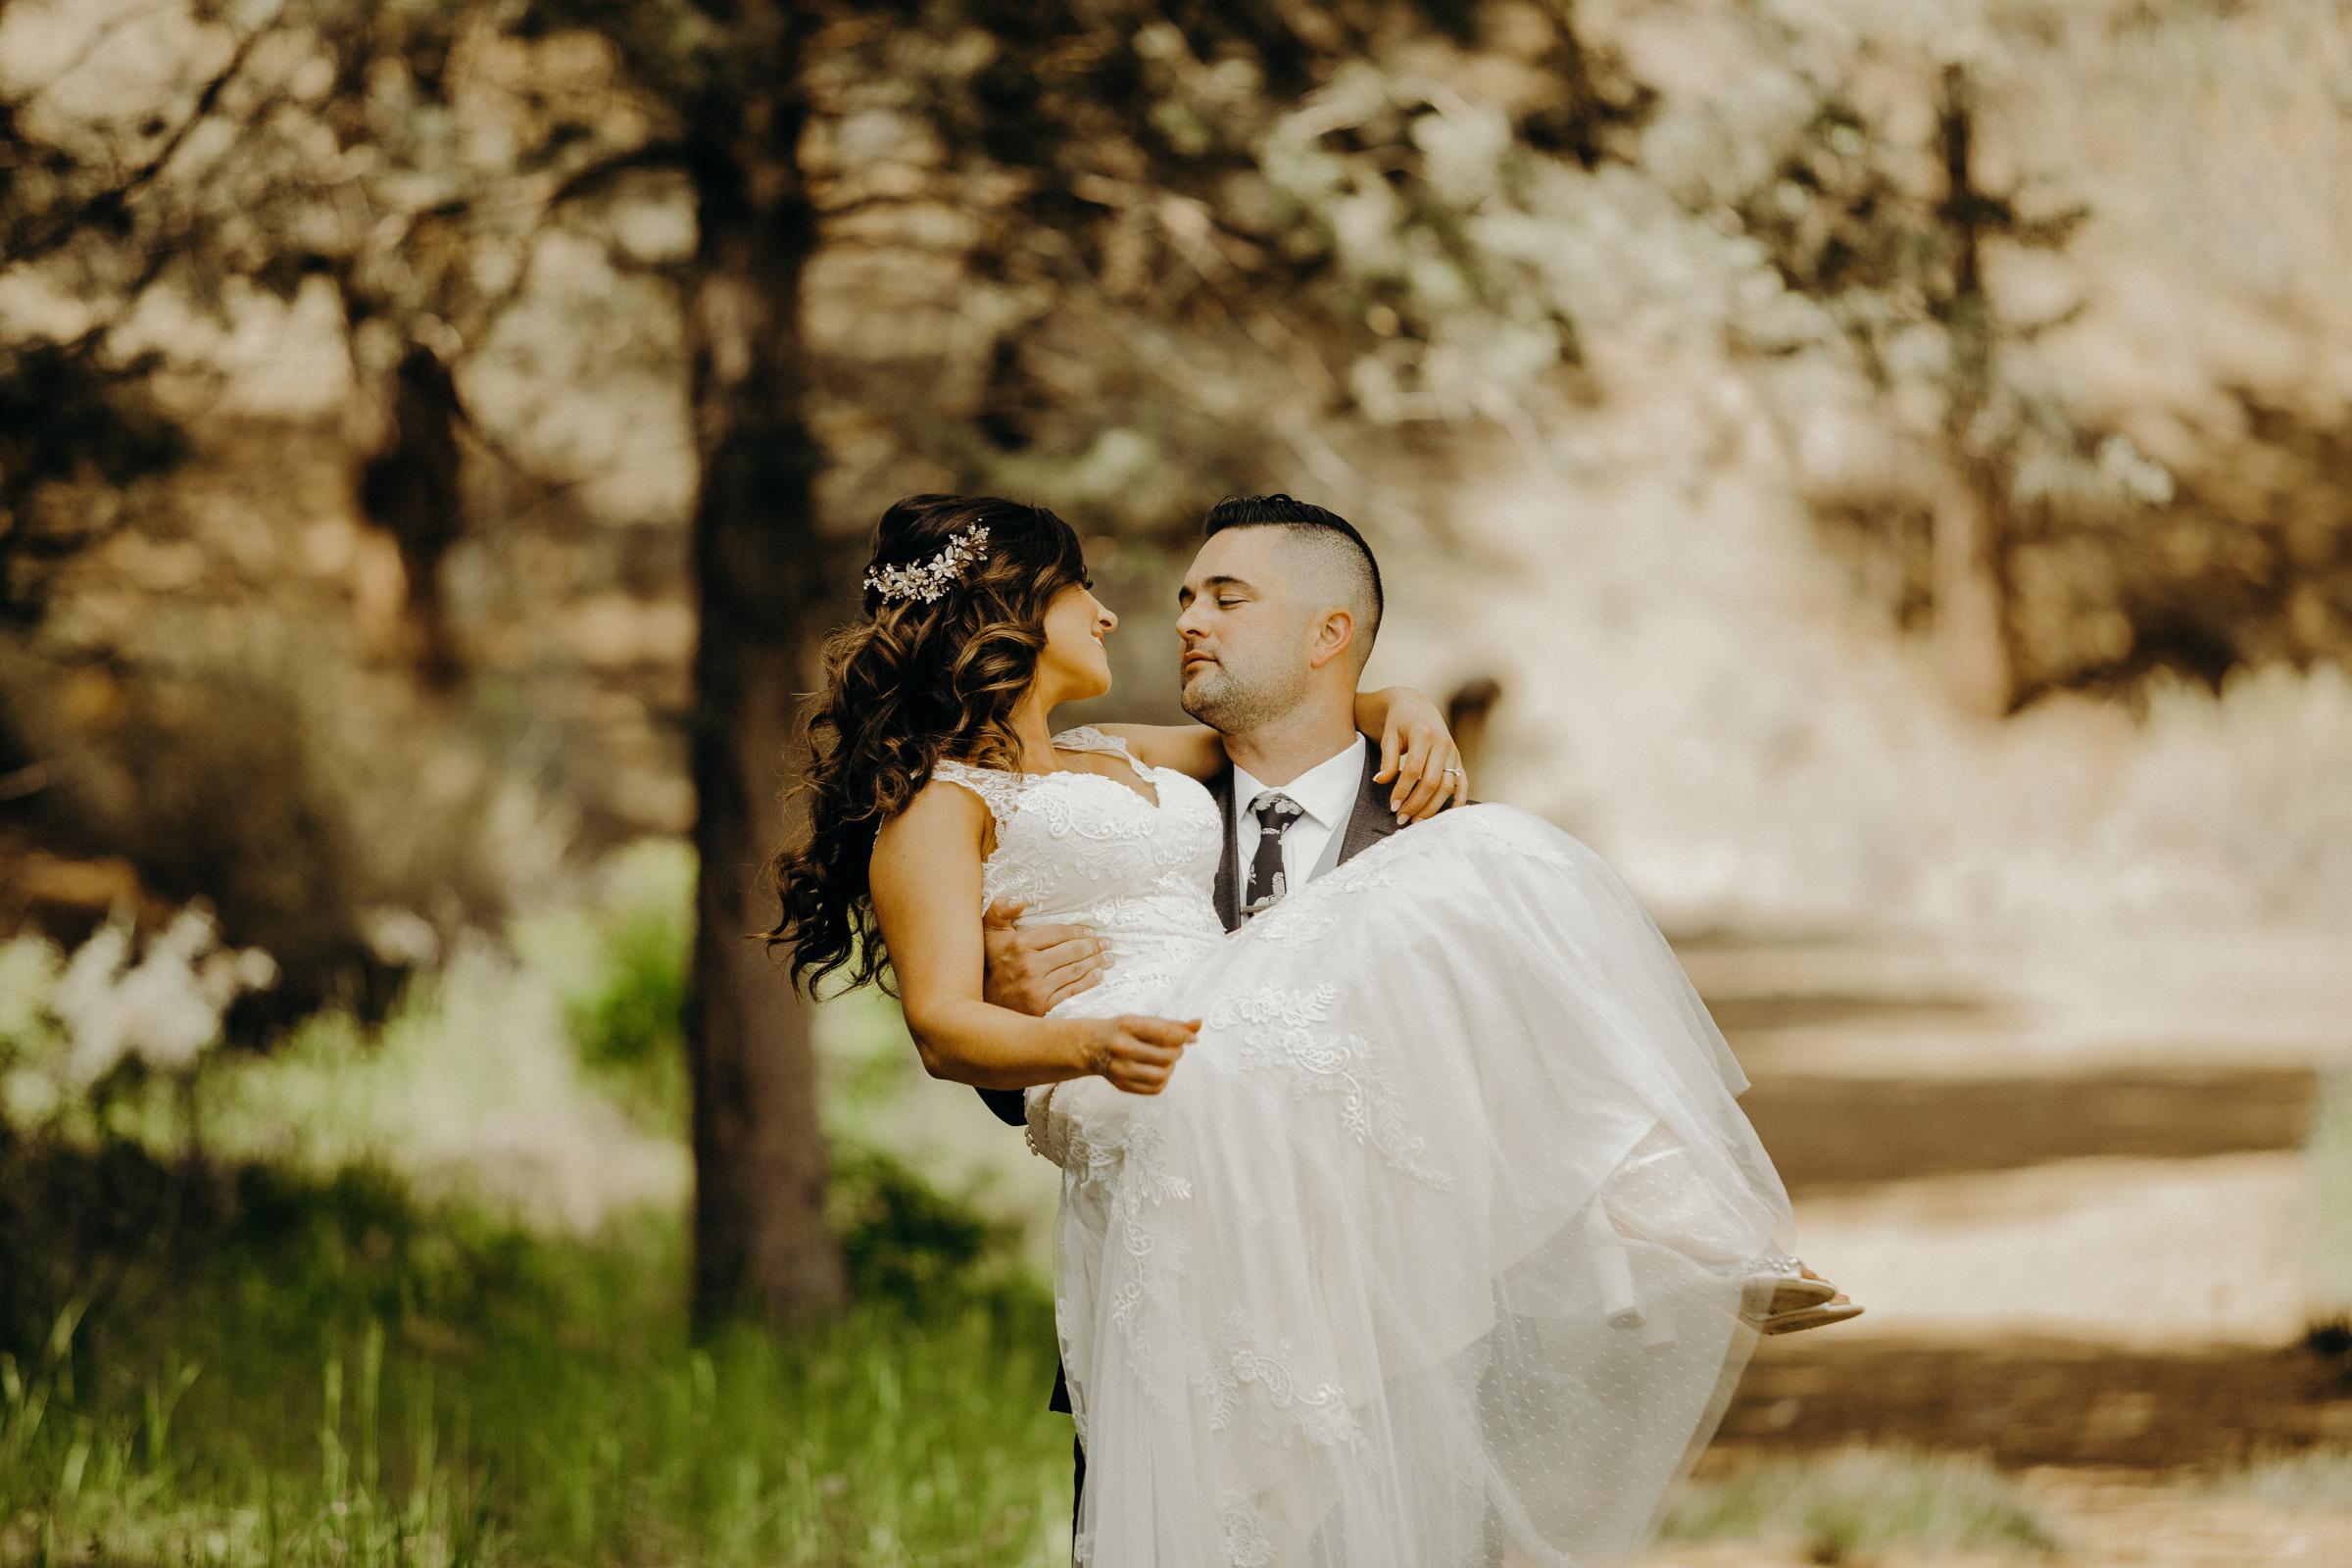 Brock + Caitlin Bend, Oregon Wedding 13.jpg